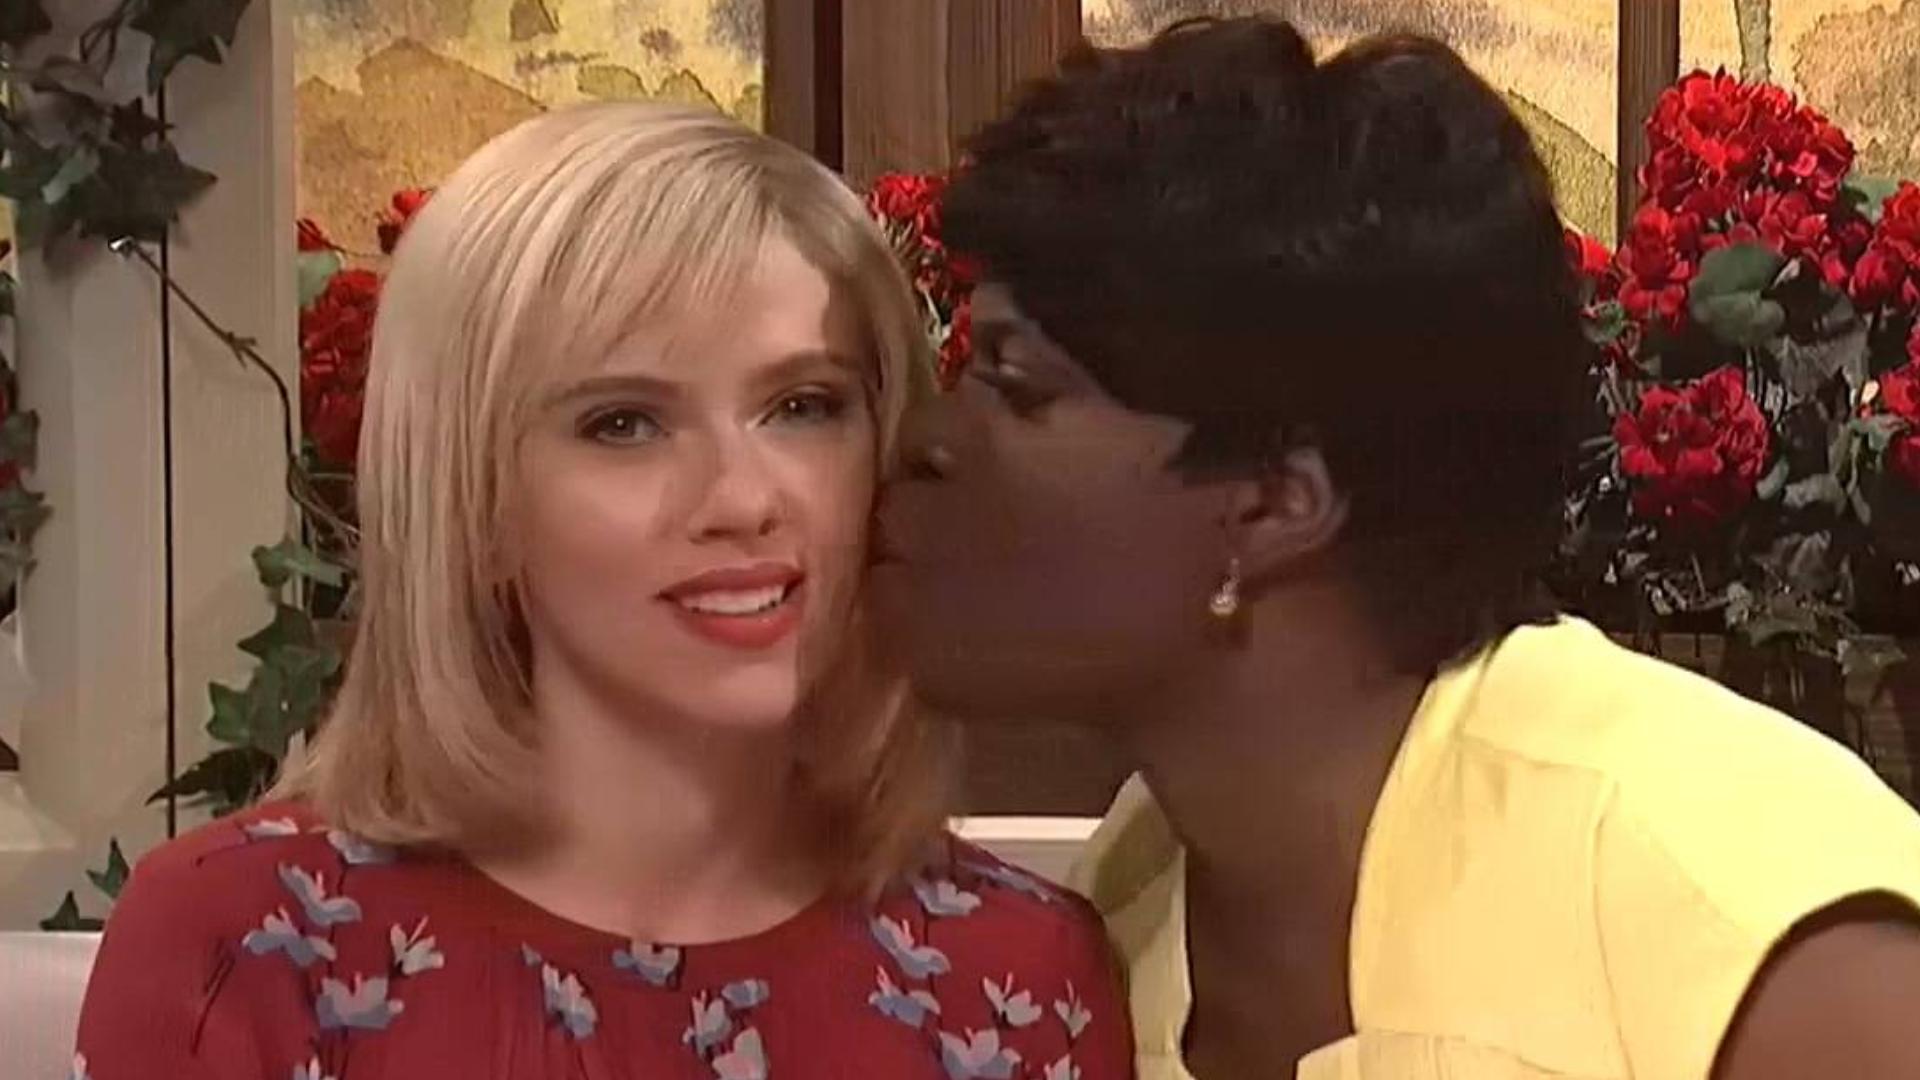 【SNL】爆笑!为了拍个广告,寡姐快疯了(周六夜现场)(中字)